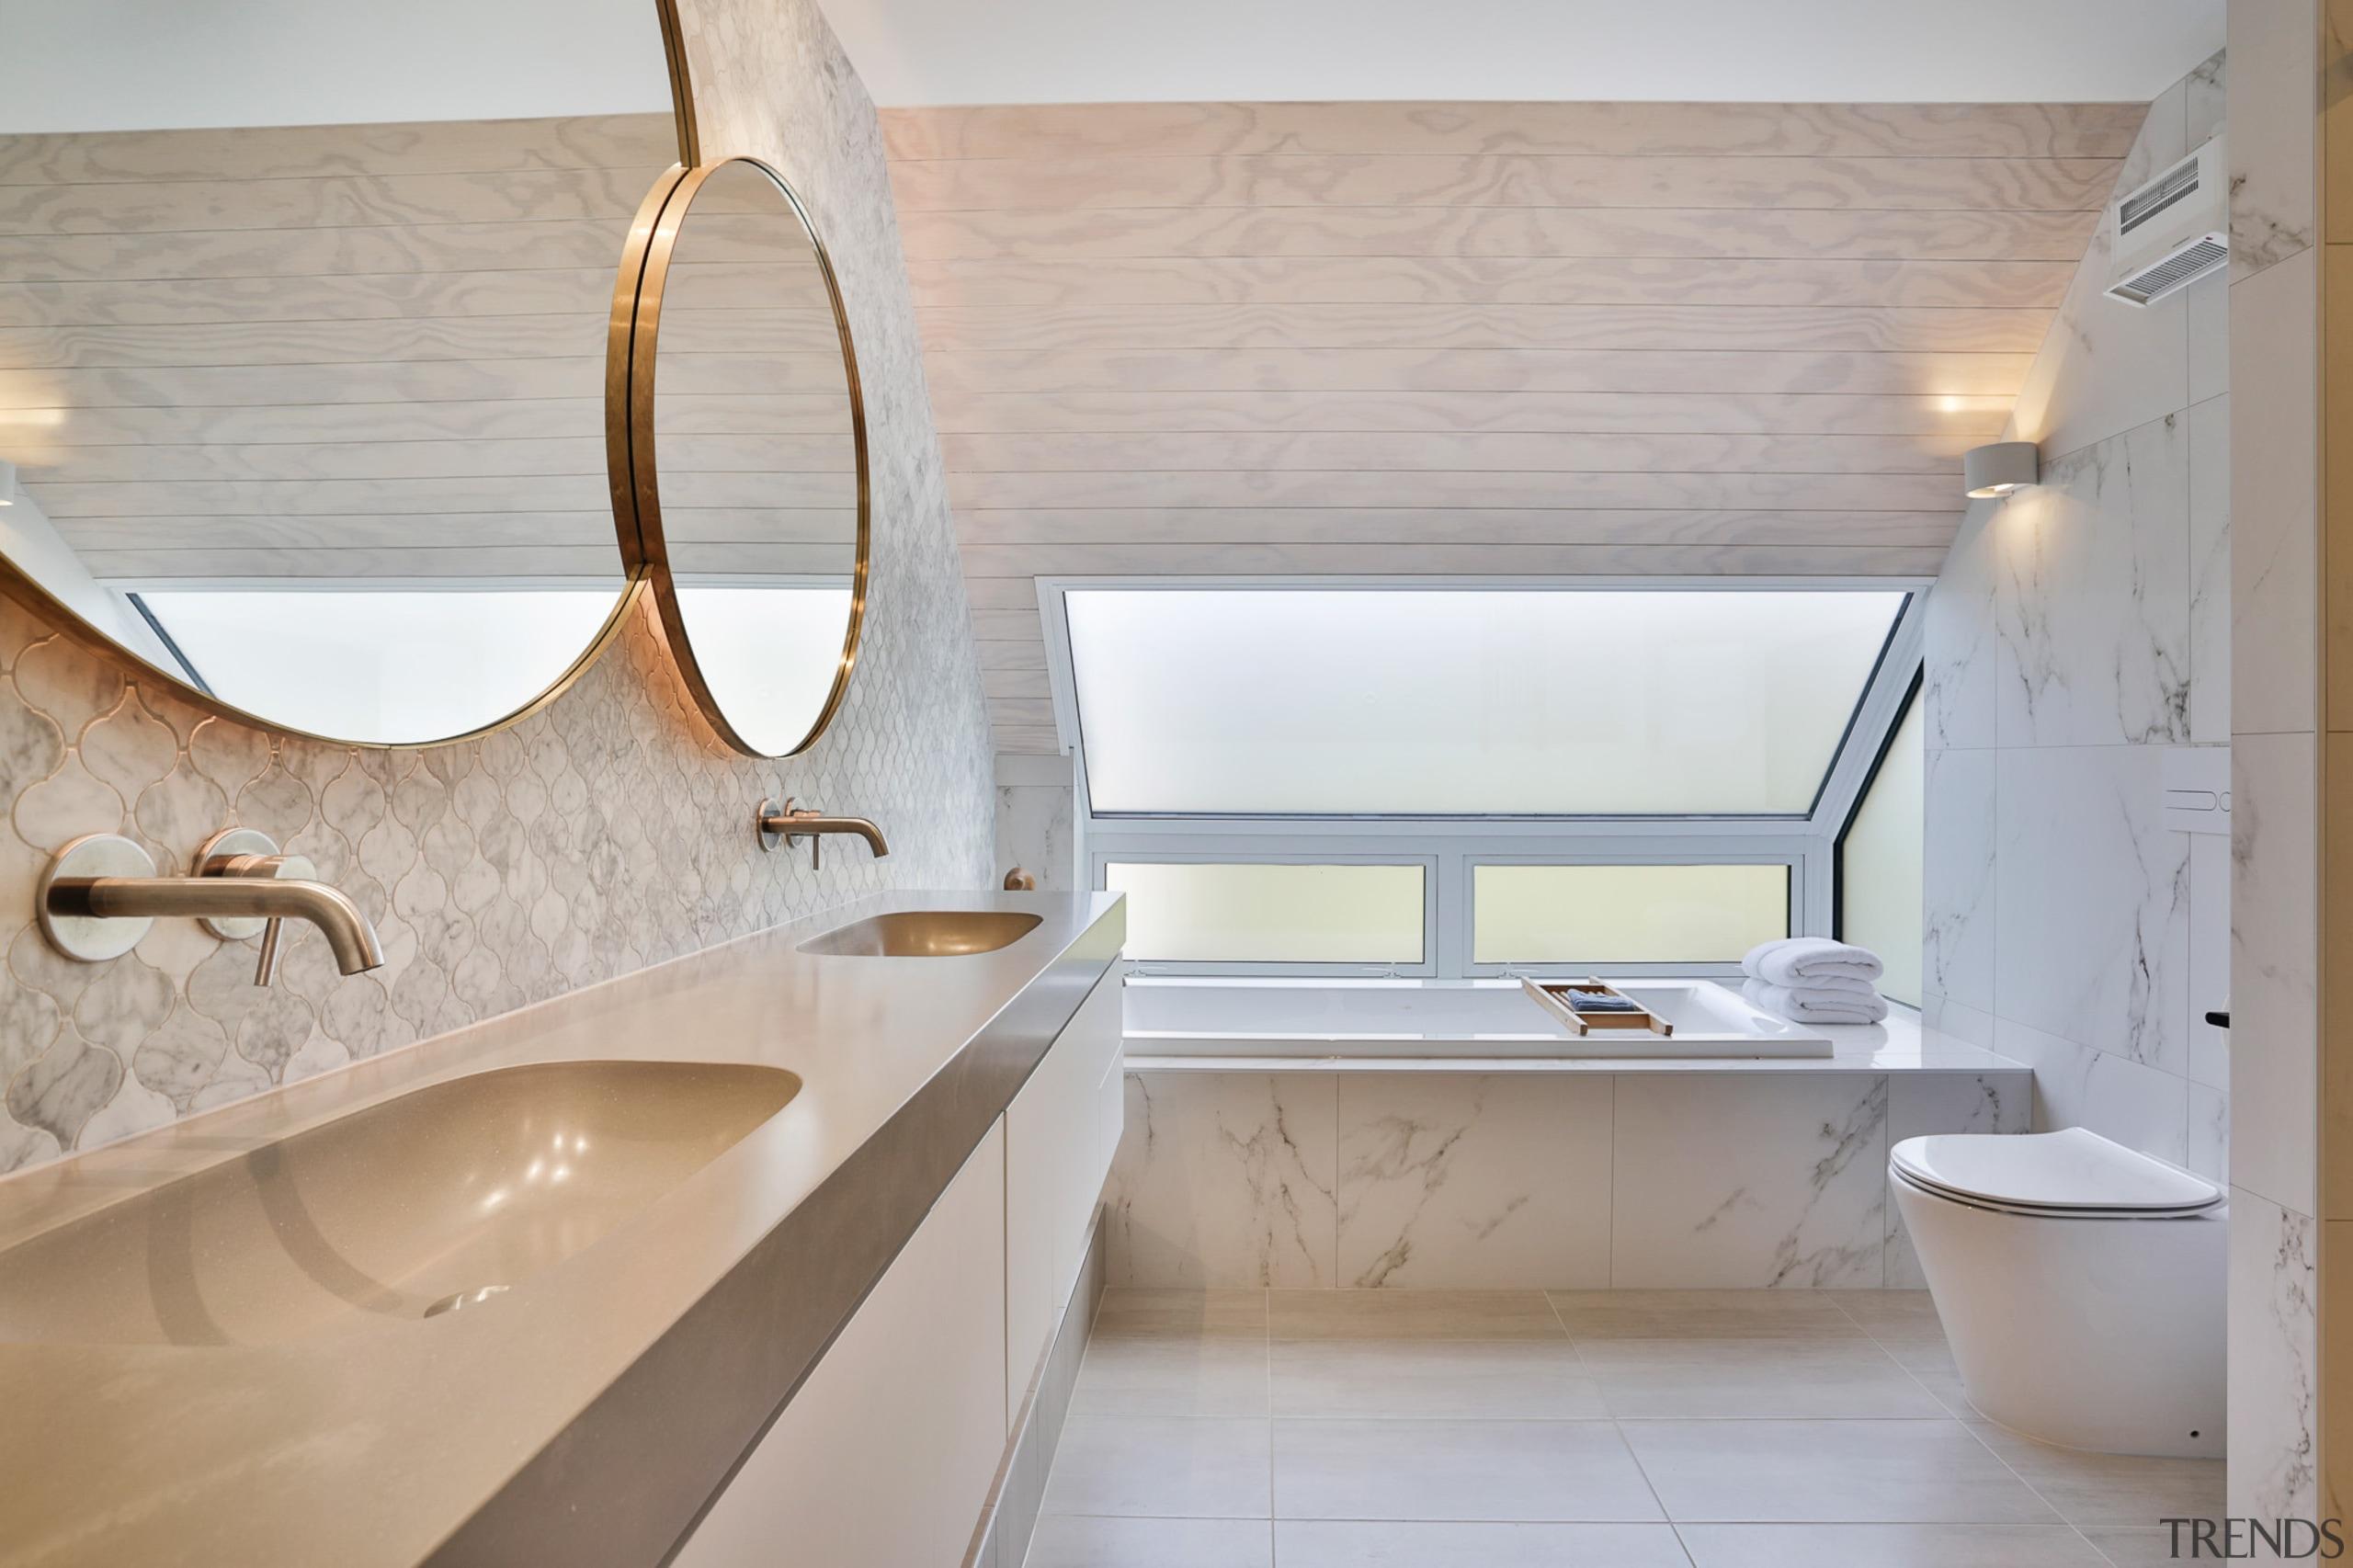 Melanie Craig Design – Highly Commended – 2019 architecture, bathroom, bathroom sink, bathtub, building, ceiling, floor, flooring, furniture, house, interior design, marble, material property, plumbing fixture, property, room, sink, tap, tile, gray